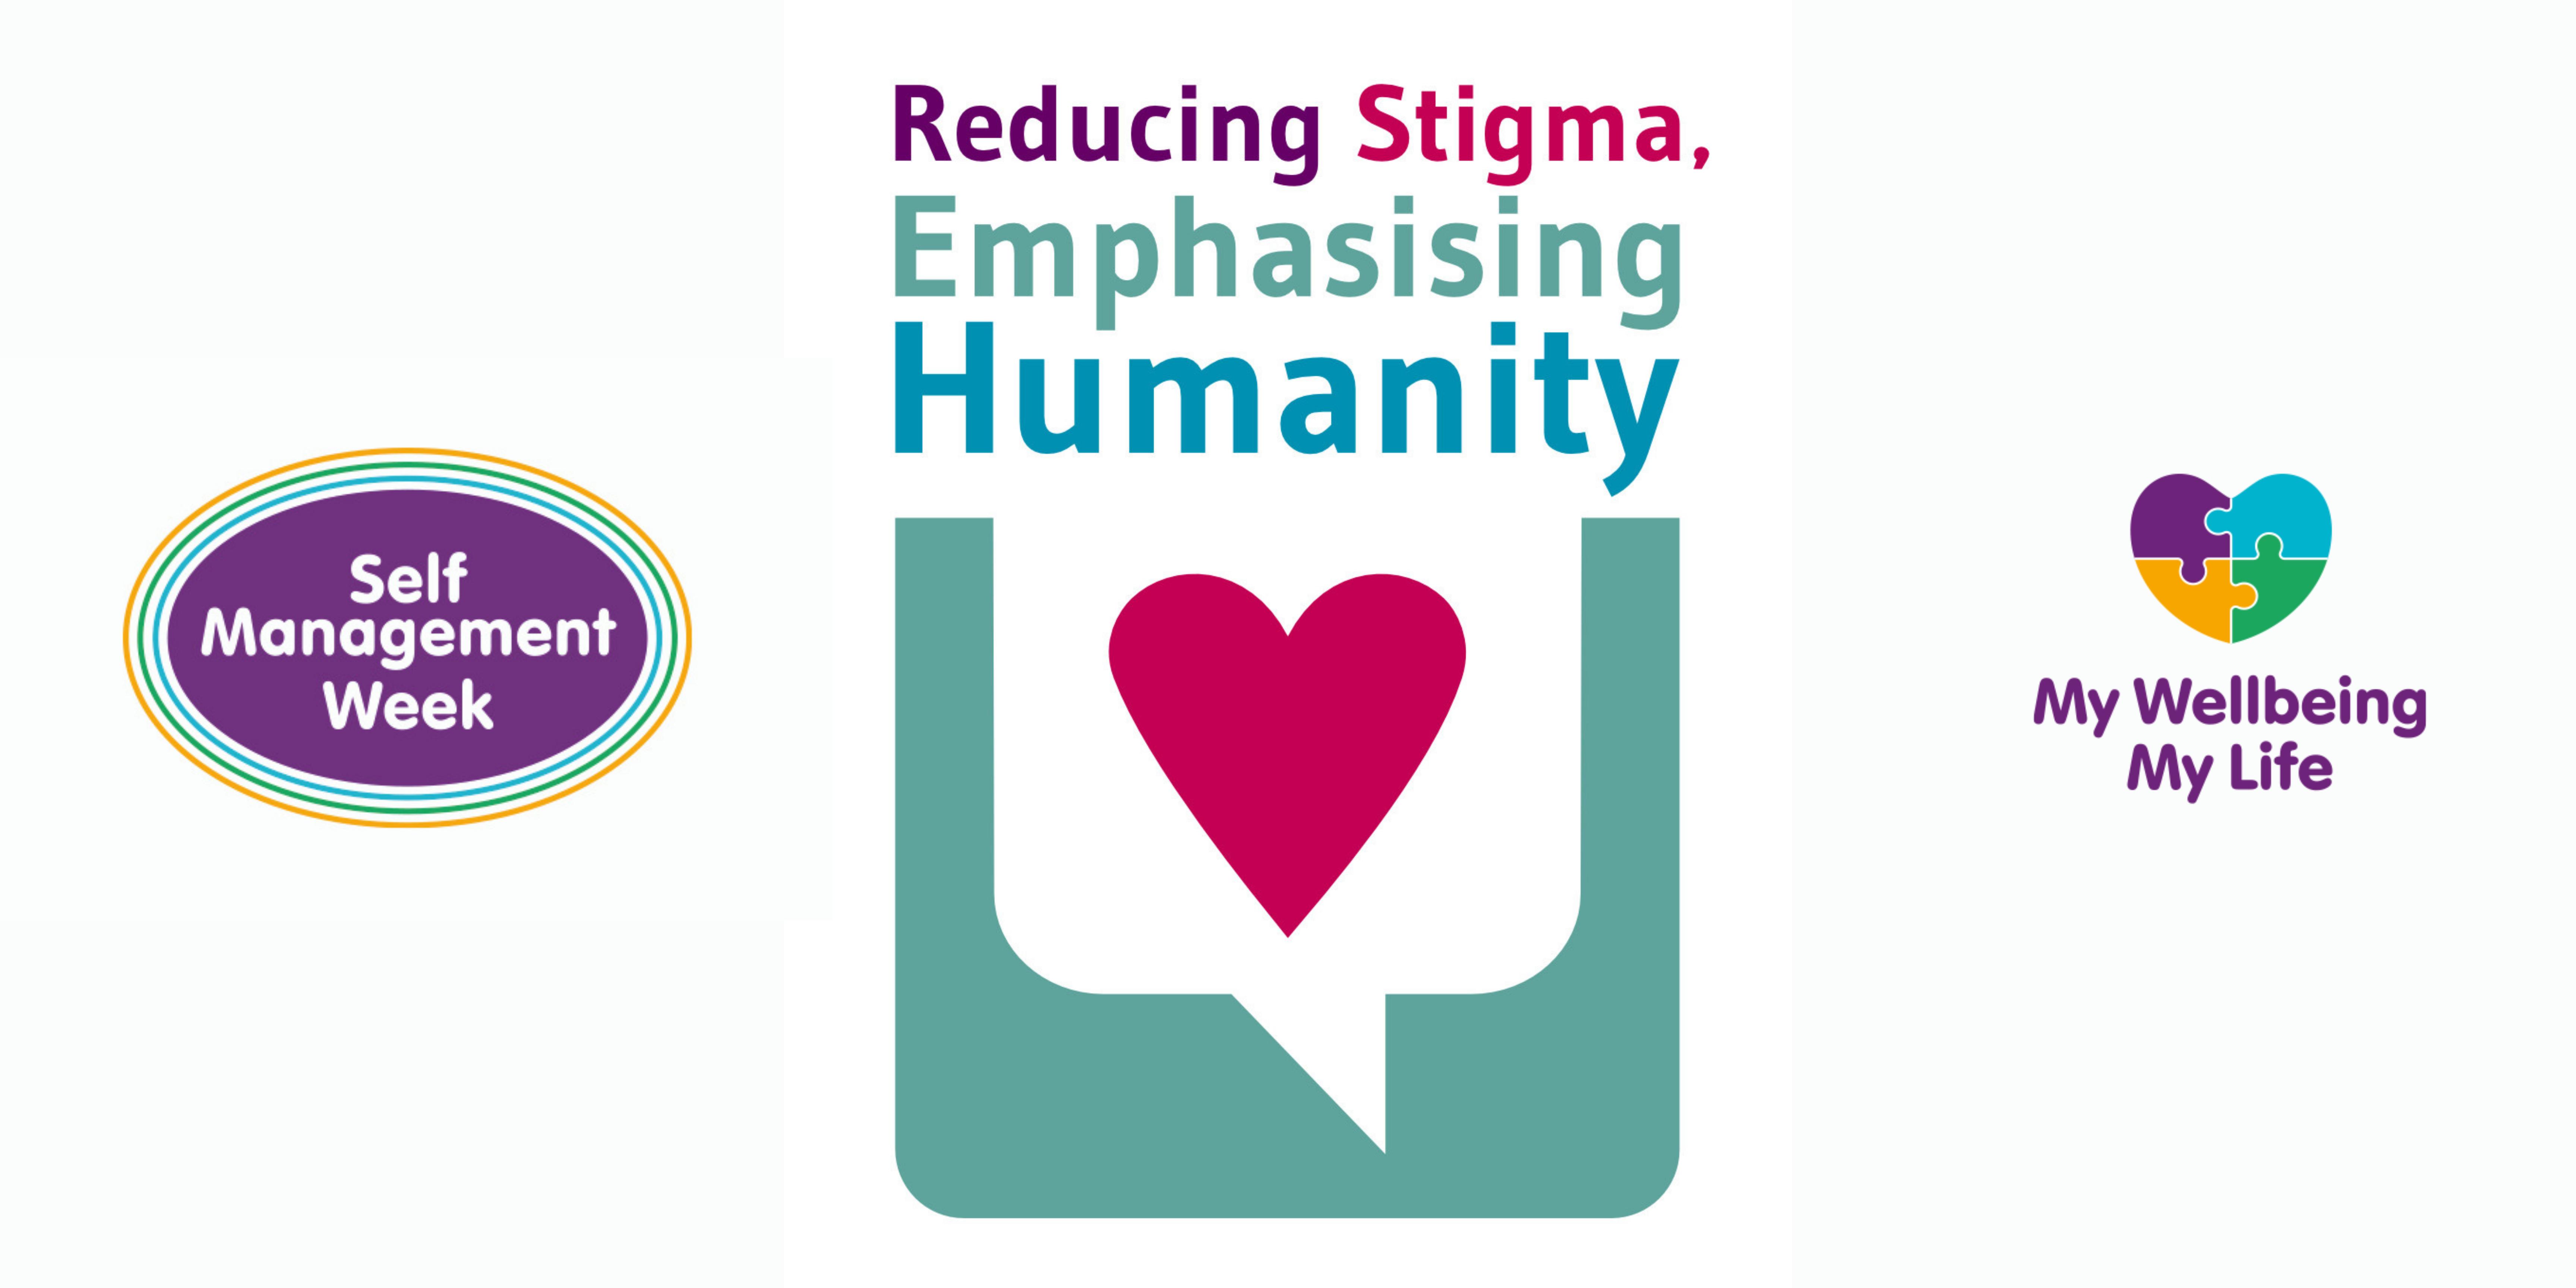 Reducing stigma, emphasising humanity